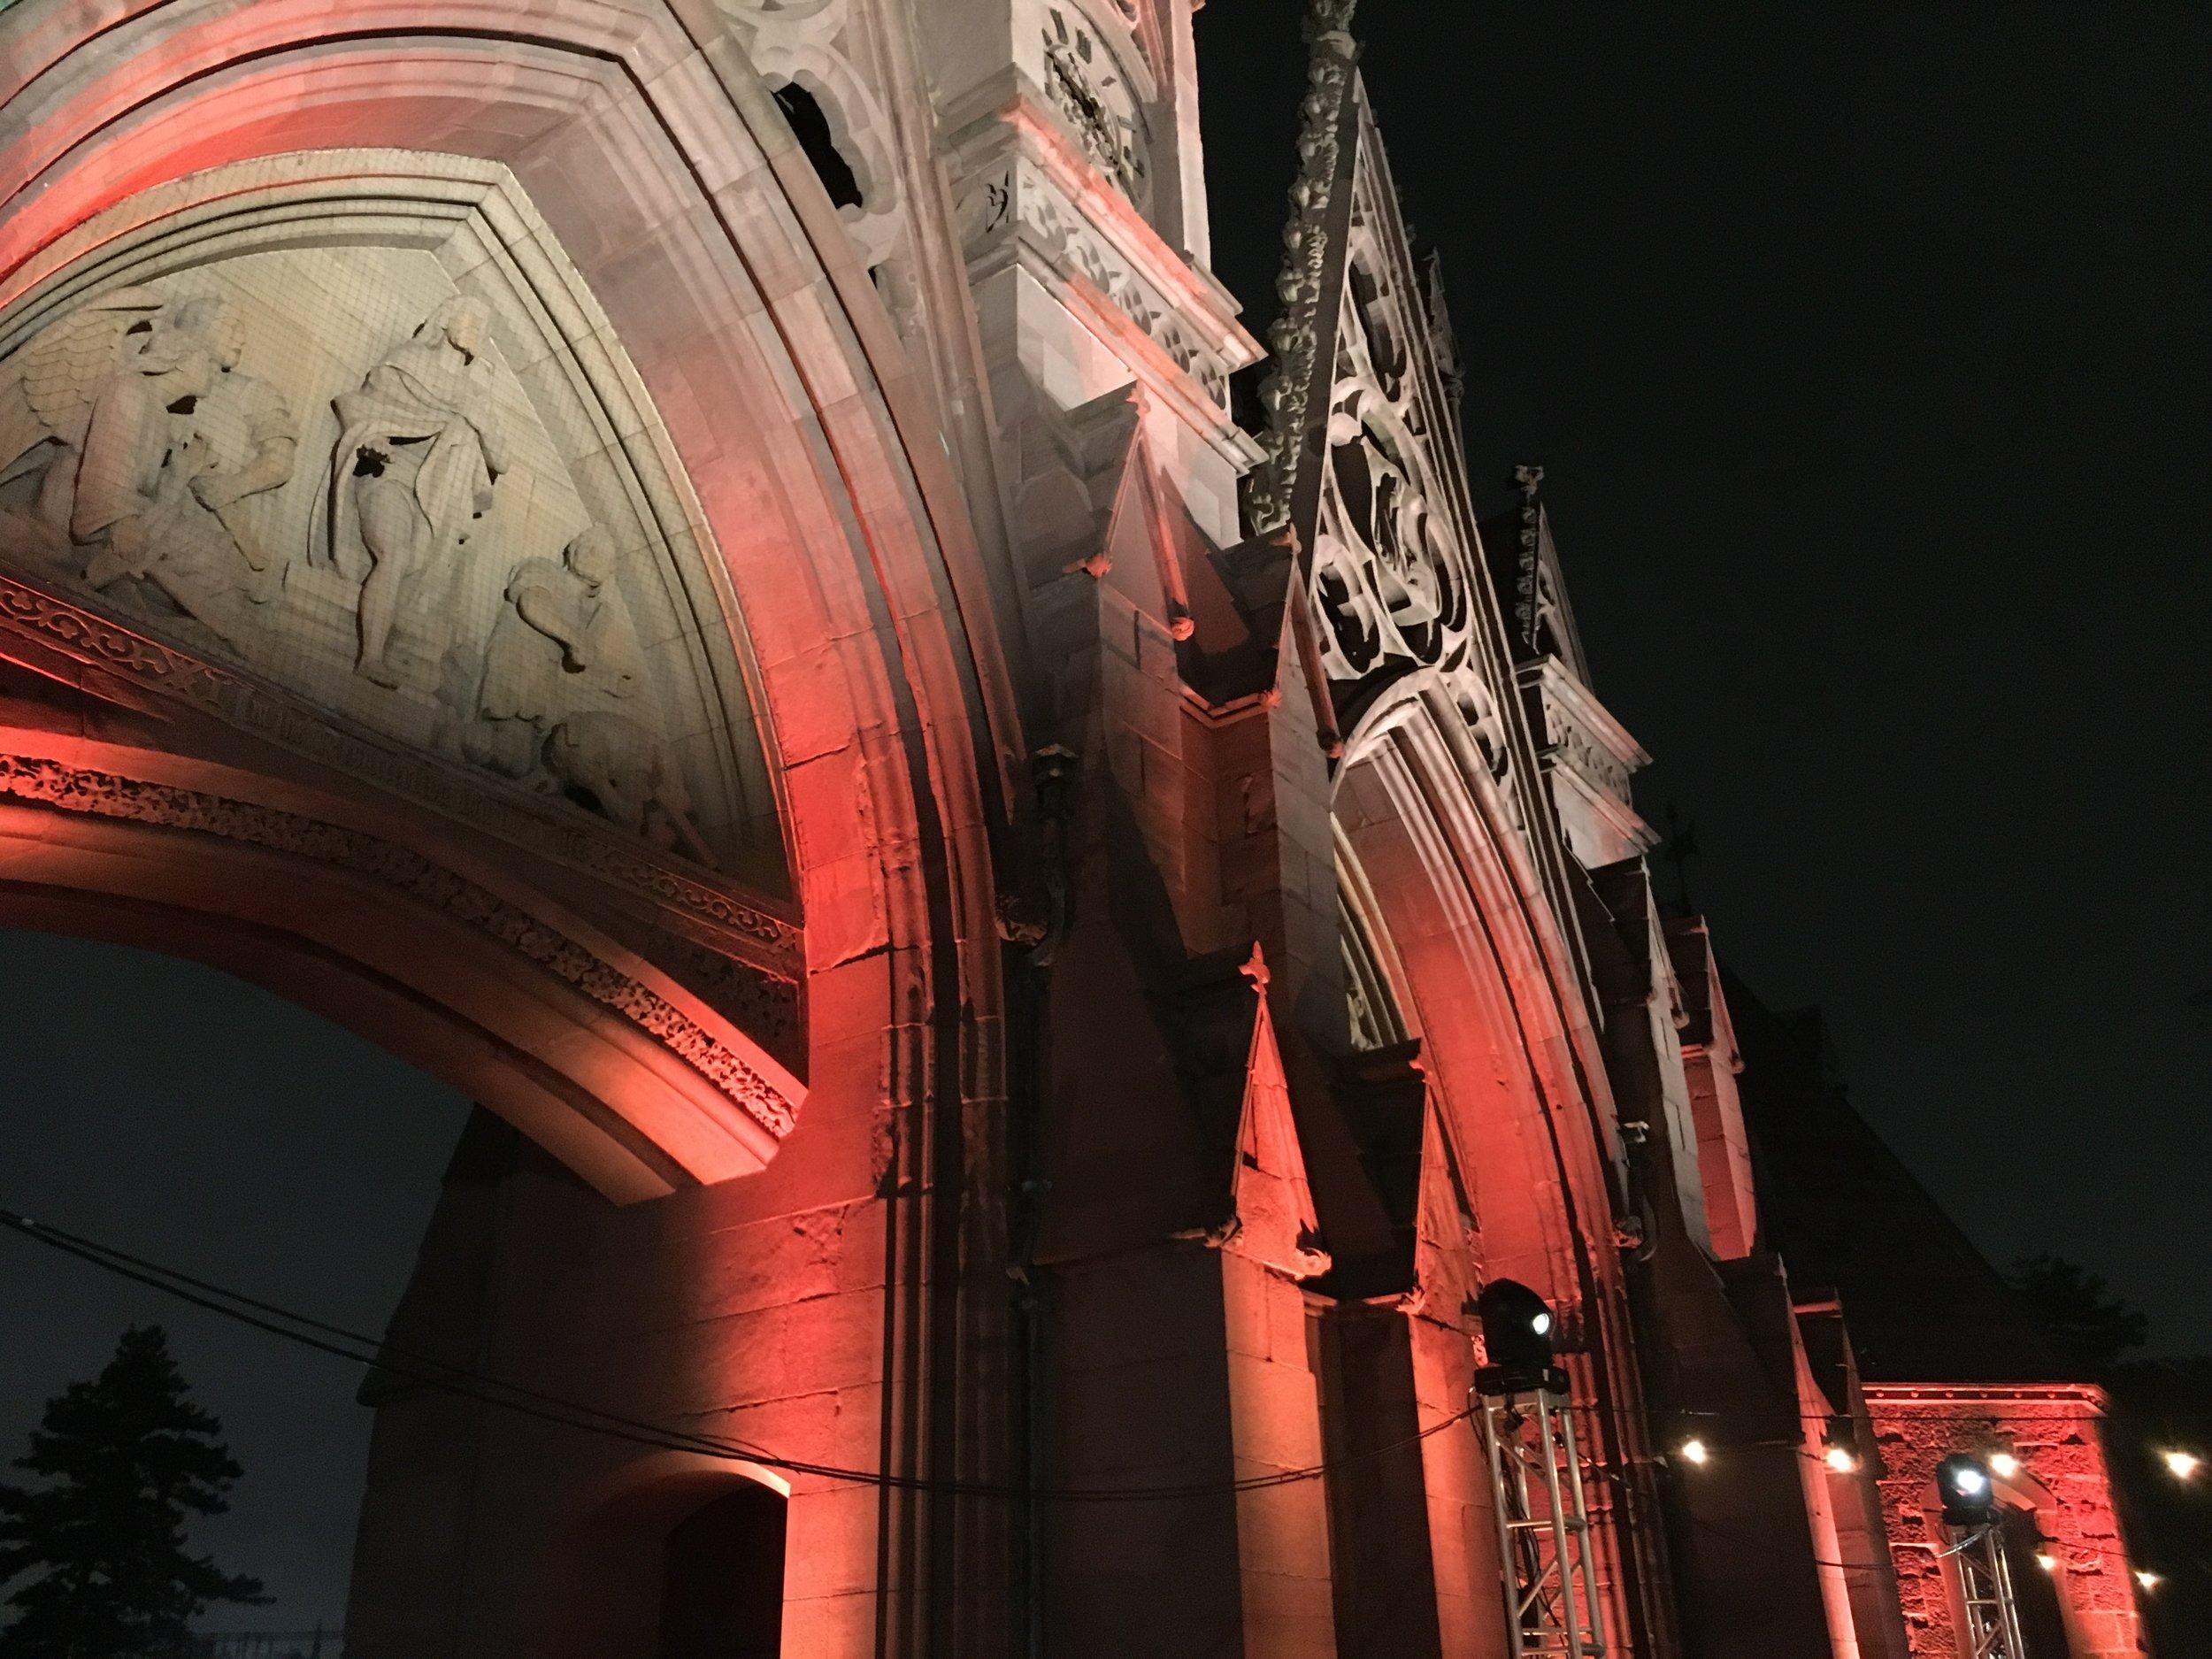 Uplighting on stone archways